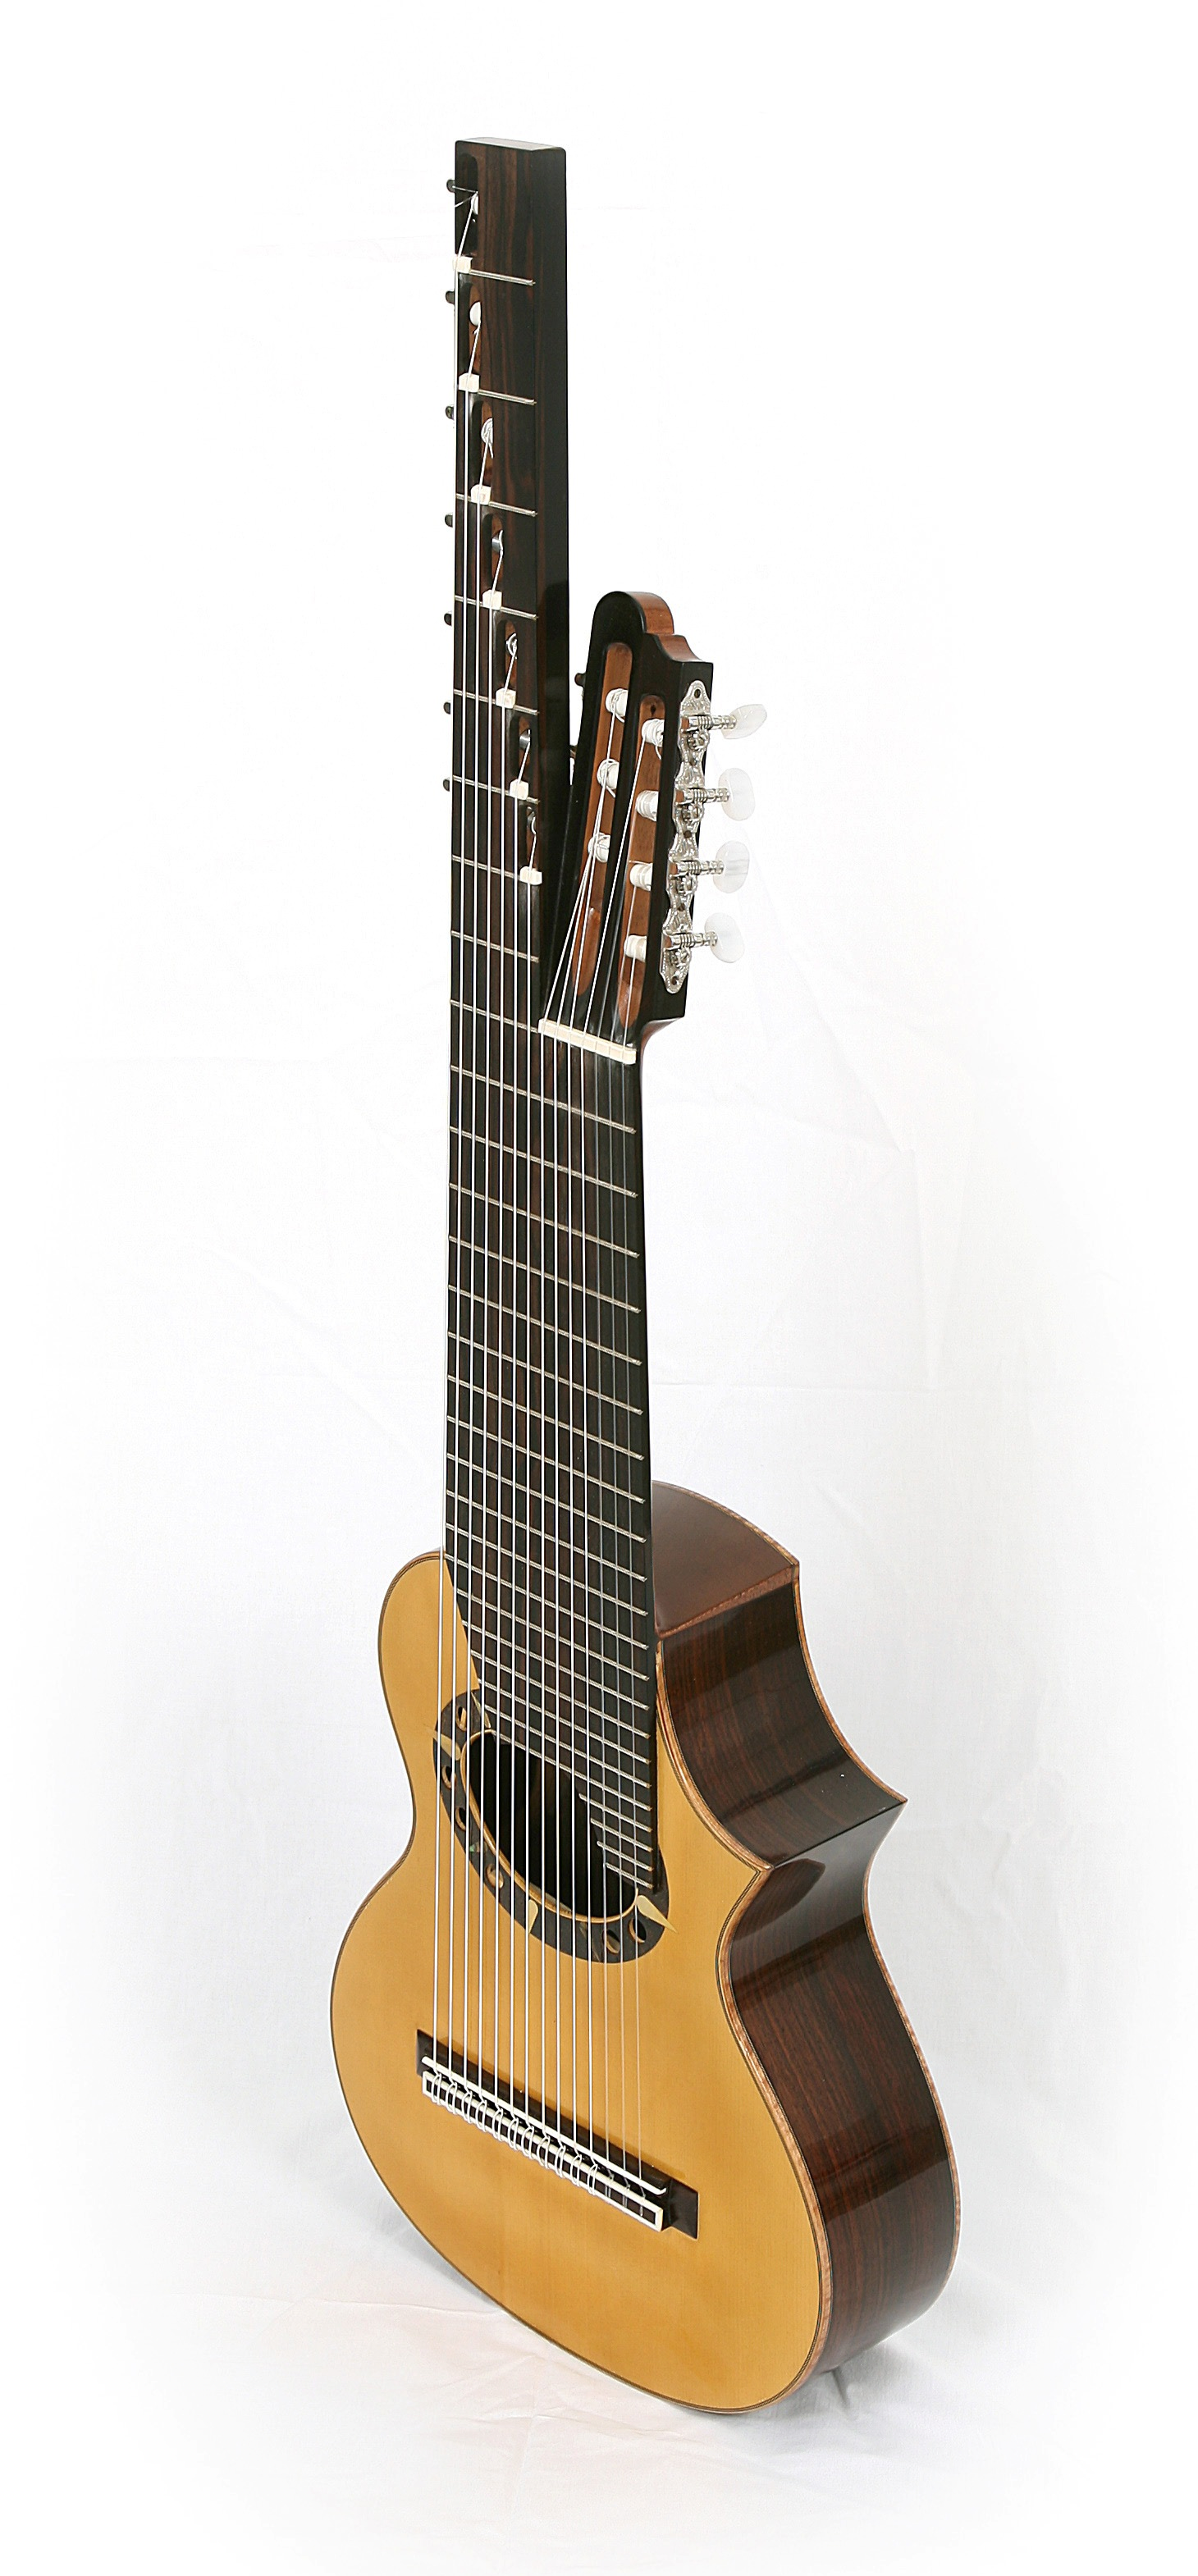 14-string Alto guitar, intonation g1-d1-a-f-c-G-F-Ess-D-C-B-A-G-F. Rodolfo Cucculelli, custom guitars.JPG